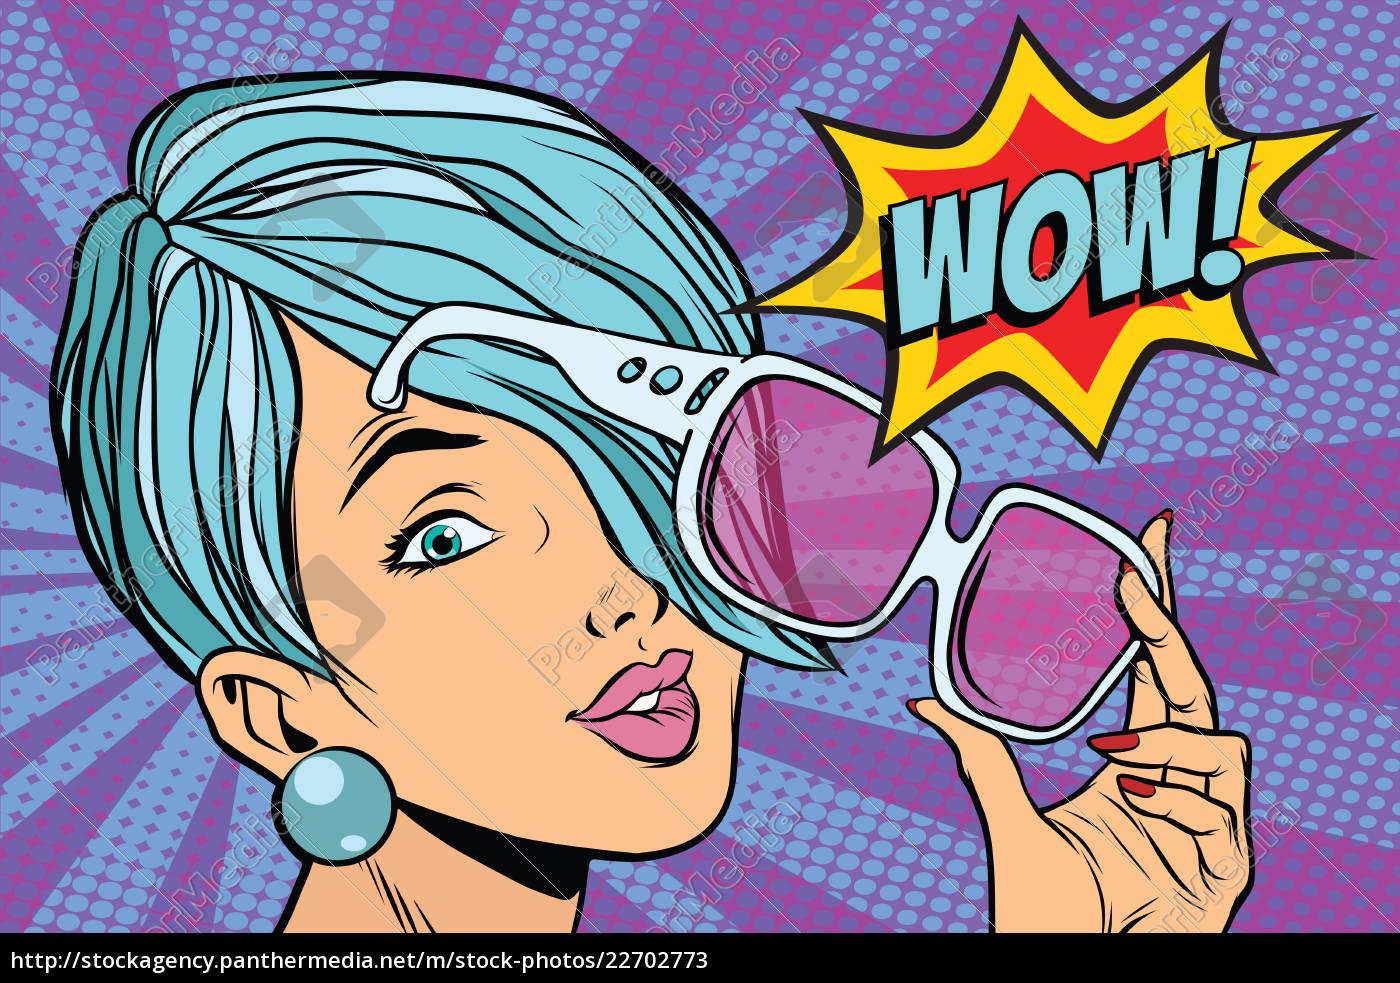 sunglasses, pop, art, woman, wow, reaction - 22702773